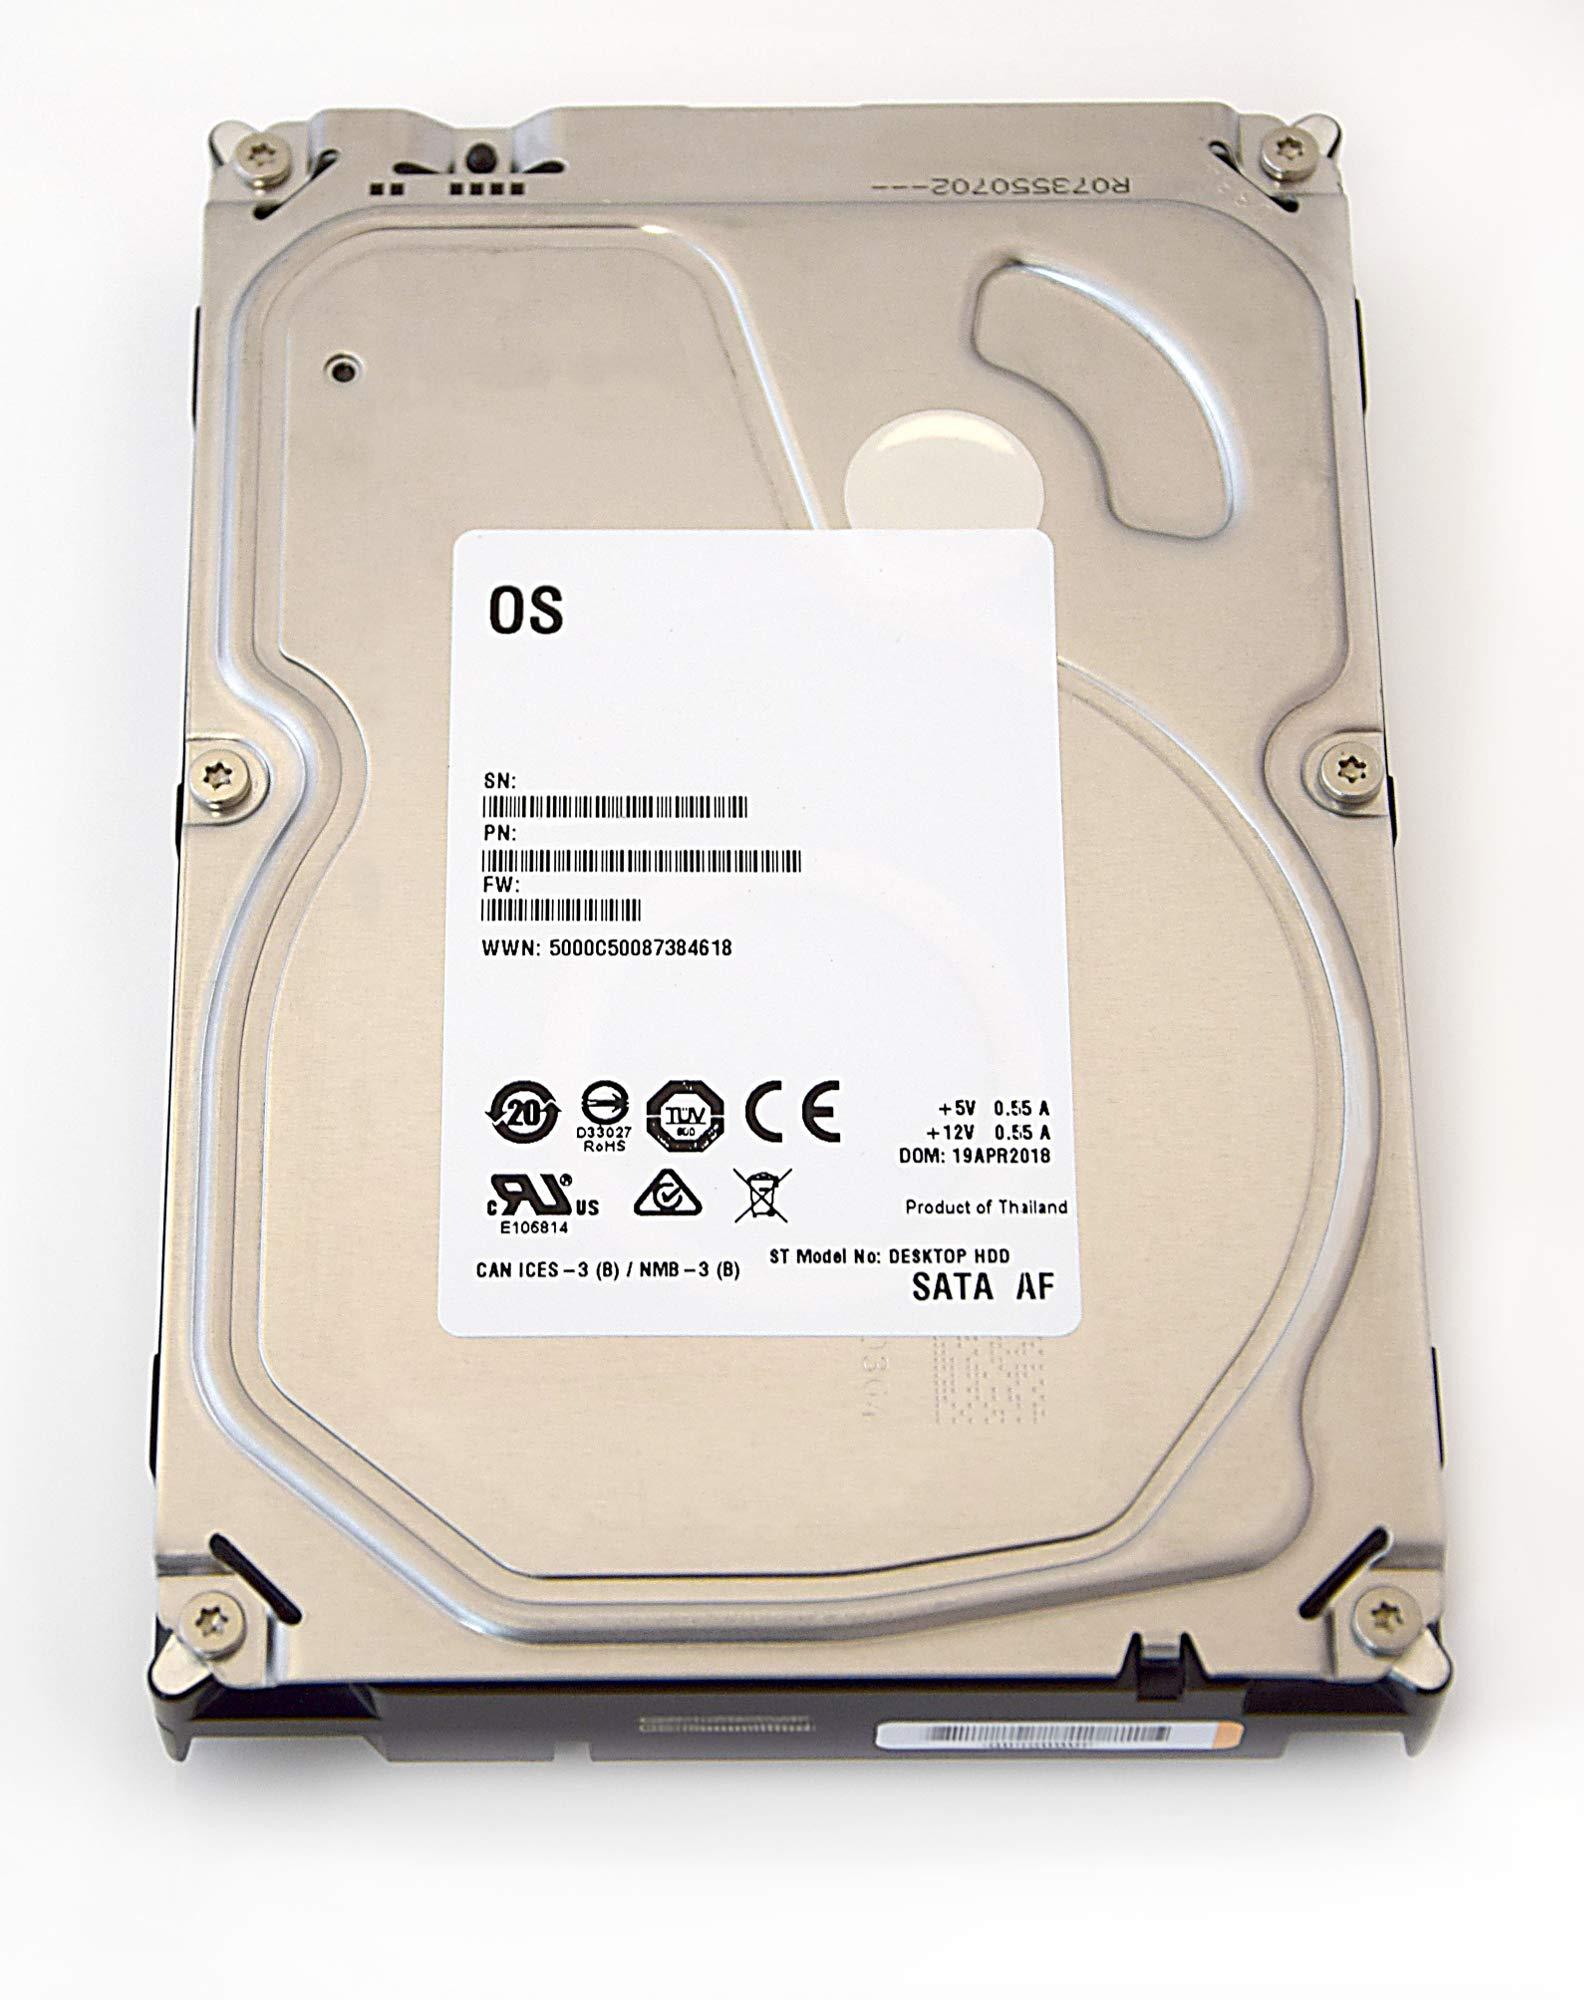 Seagate-Barracudadesktop-HDD-White-Label-internal-hard-drive-35-inch-89-cm-PC-HDD-NAS-min-5400RPM-SATA-600-SATA3-Serial-ATA-recertified